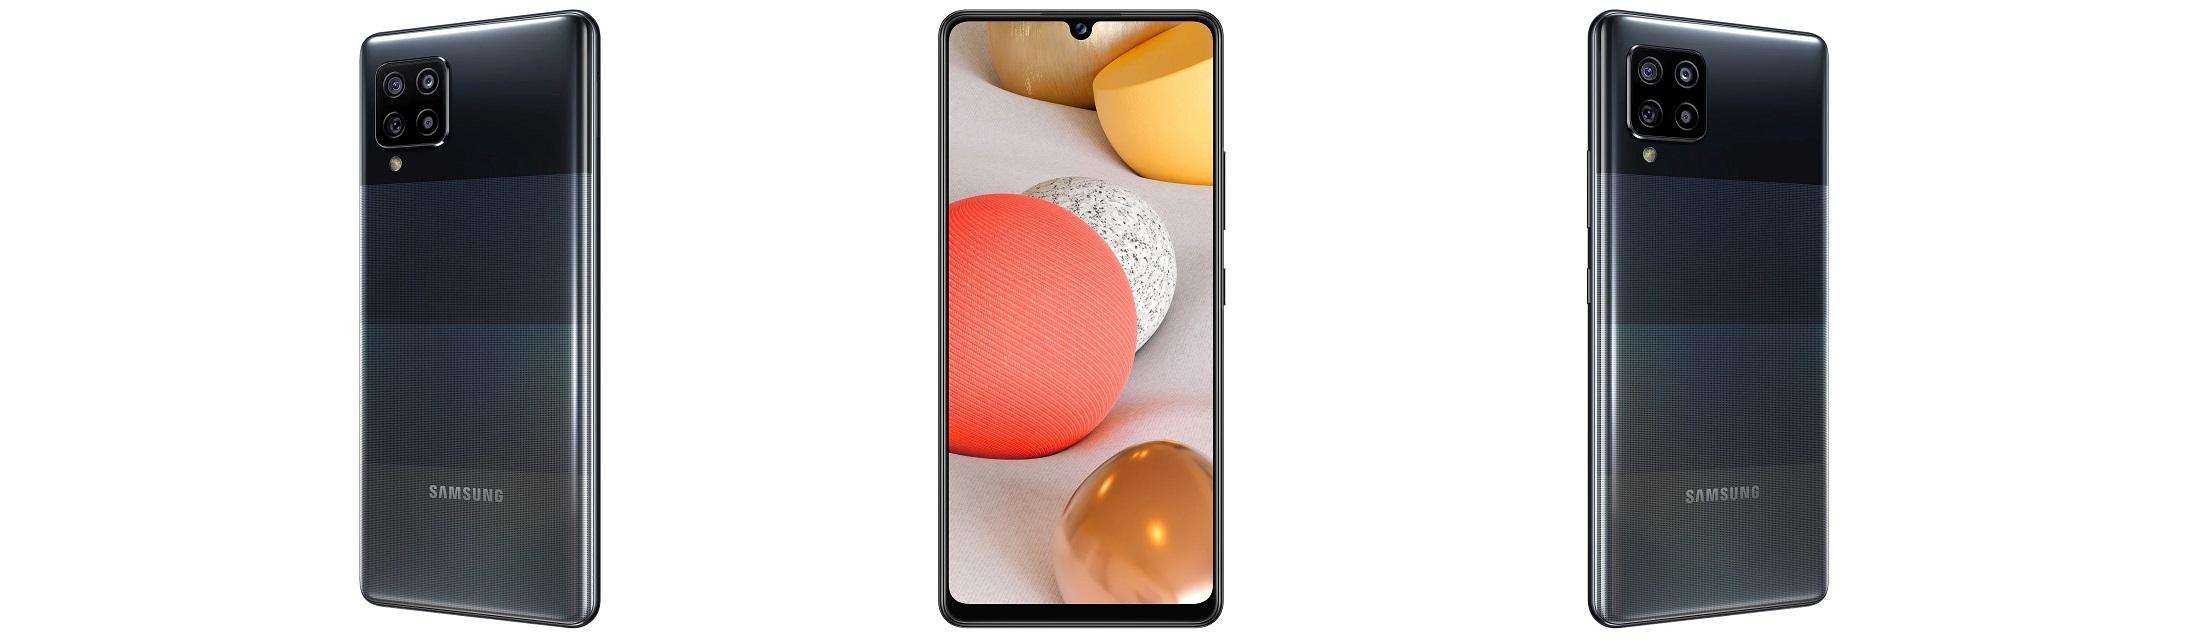 smartfon Samsung Galaxy A42 5G smartphone